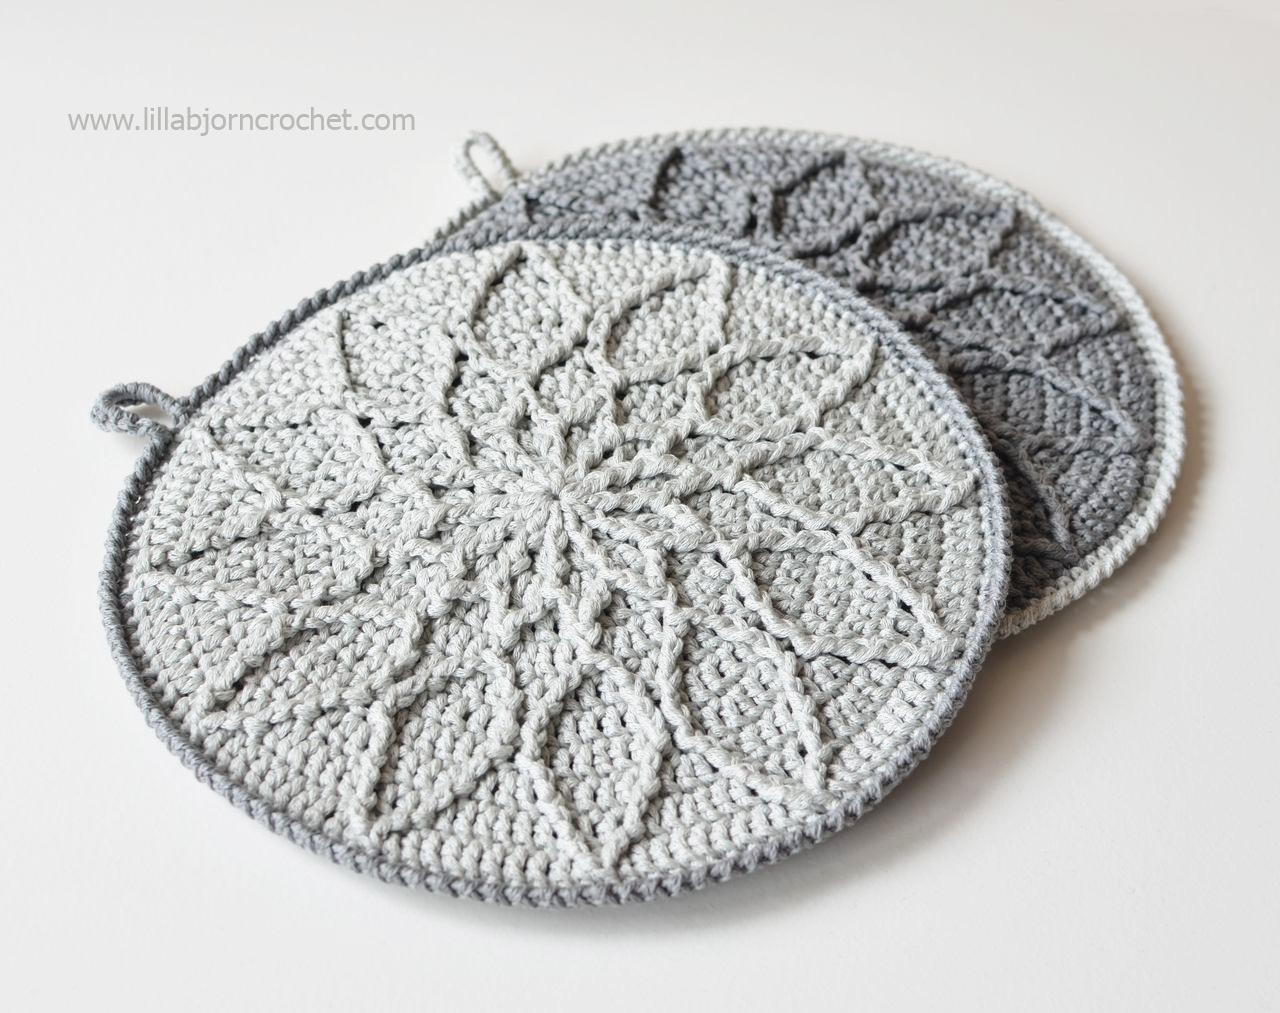 Minimalist Cabled Mandala potholder - crochet pattern by Lilla Bjorn Crochet